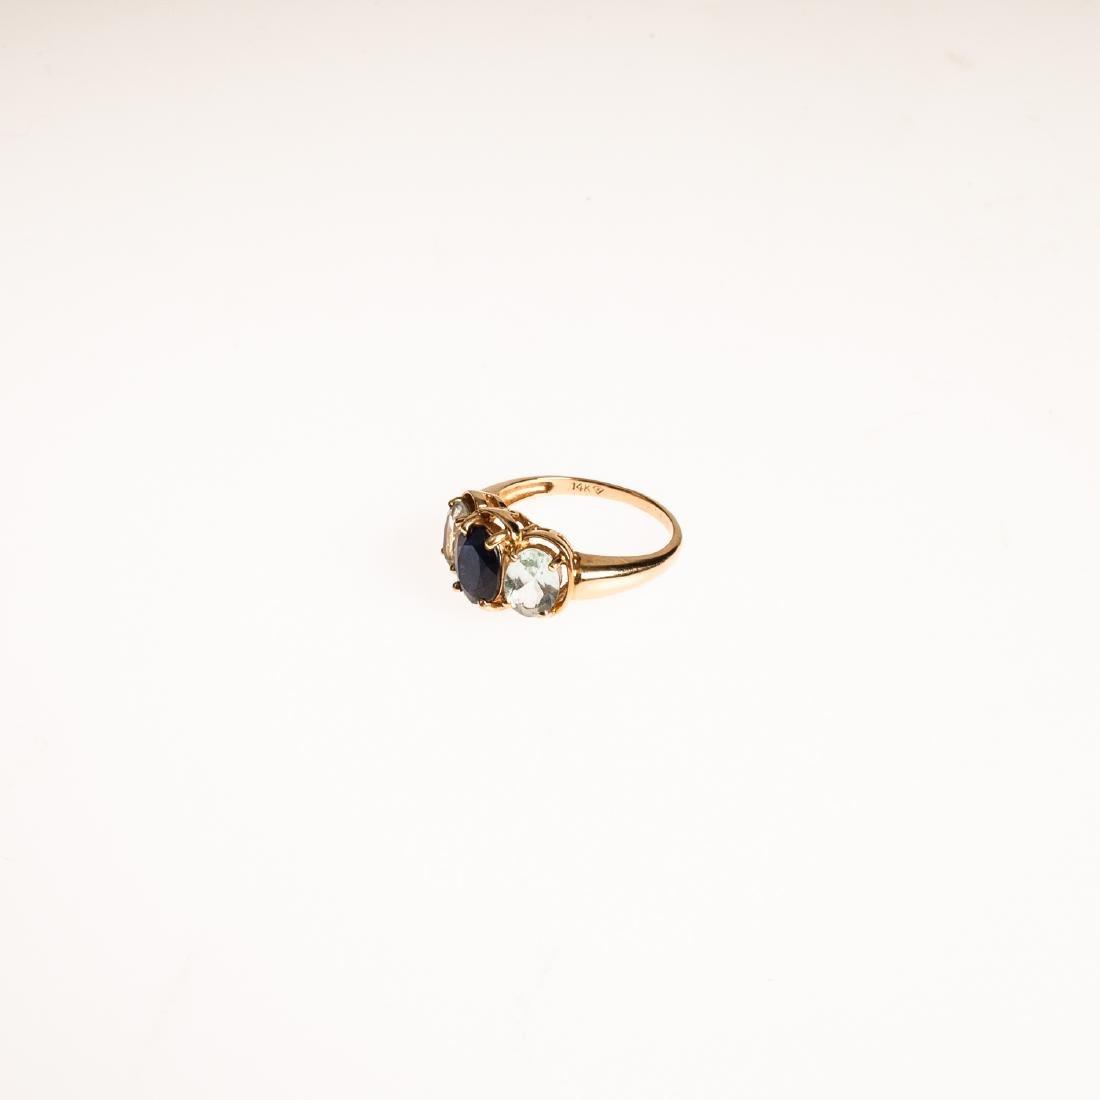 2pcs Sapphire 14 KARAT GOLD FINE ESTATE JEWELRY - 4